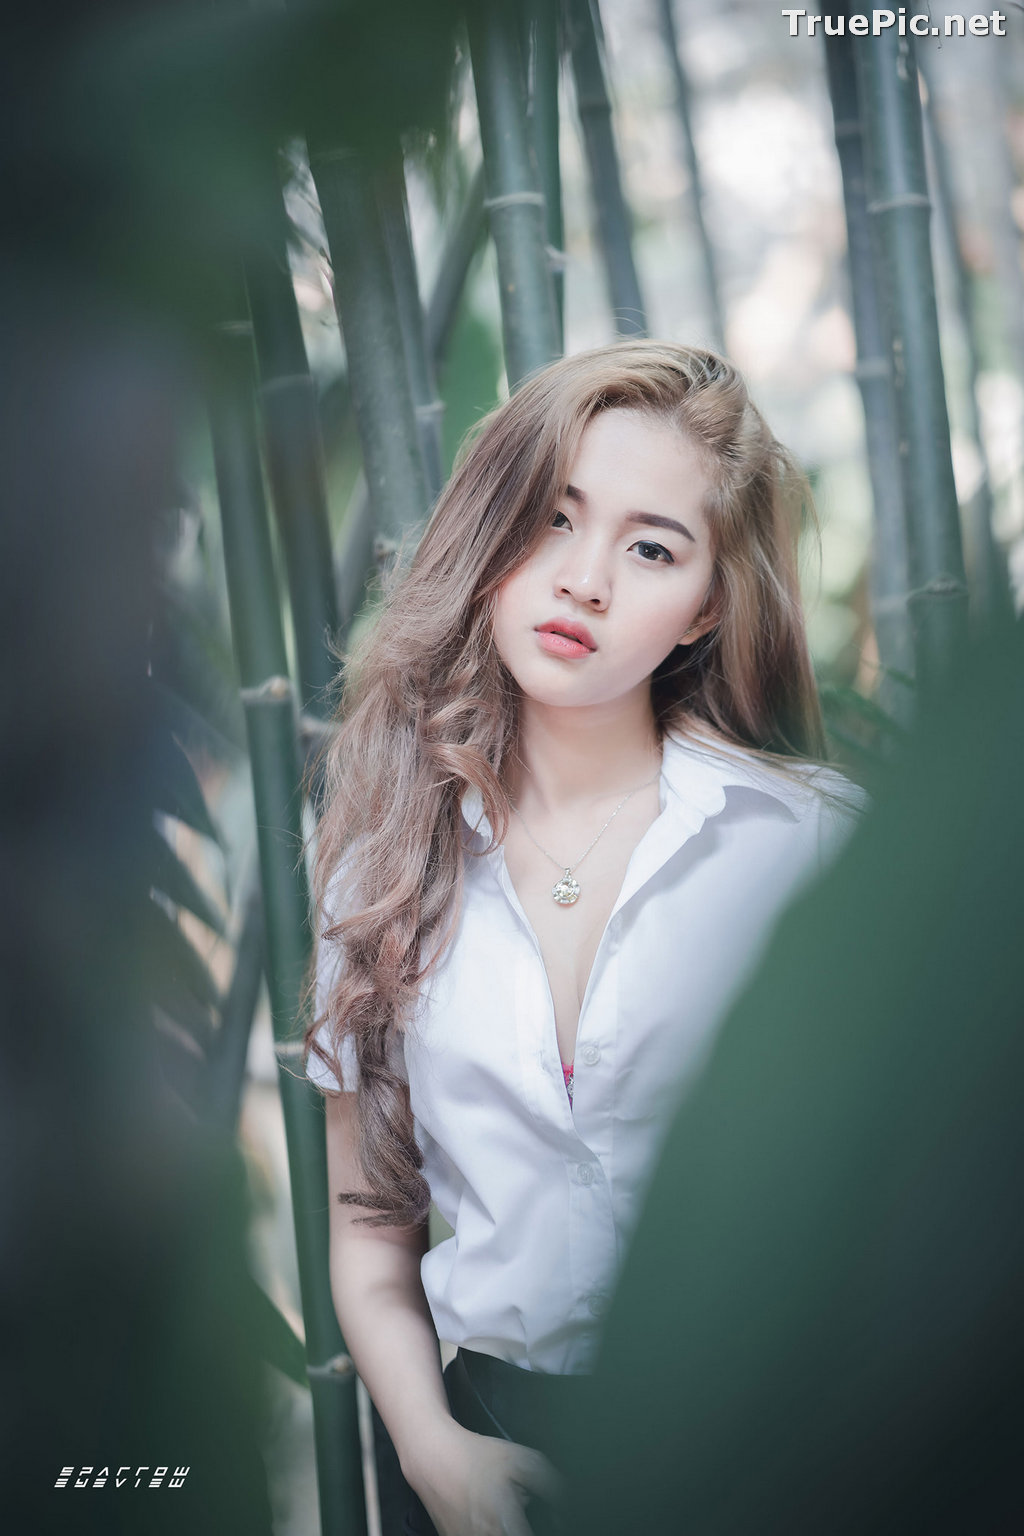 Image Thailand Model - นิภาภรณ์ เลิศนิติวัฒนา - Student Uniform - TruePic.net - Picture-10